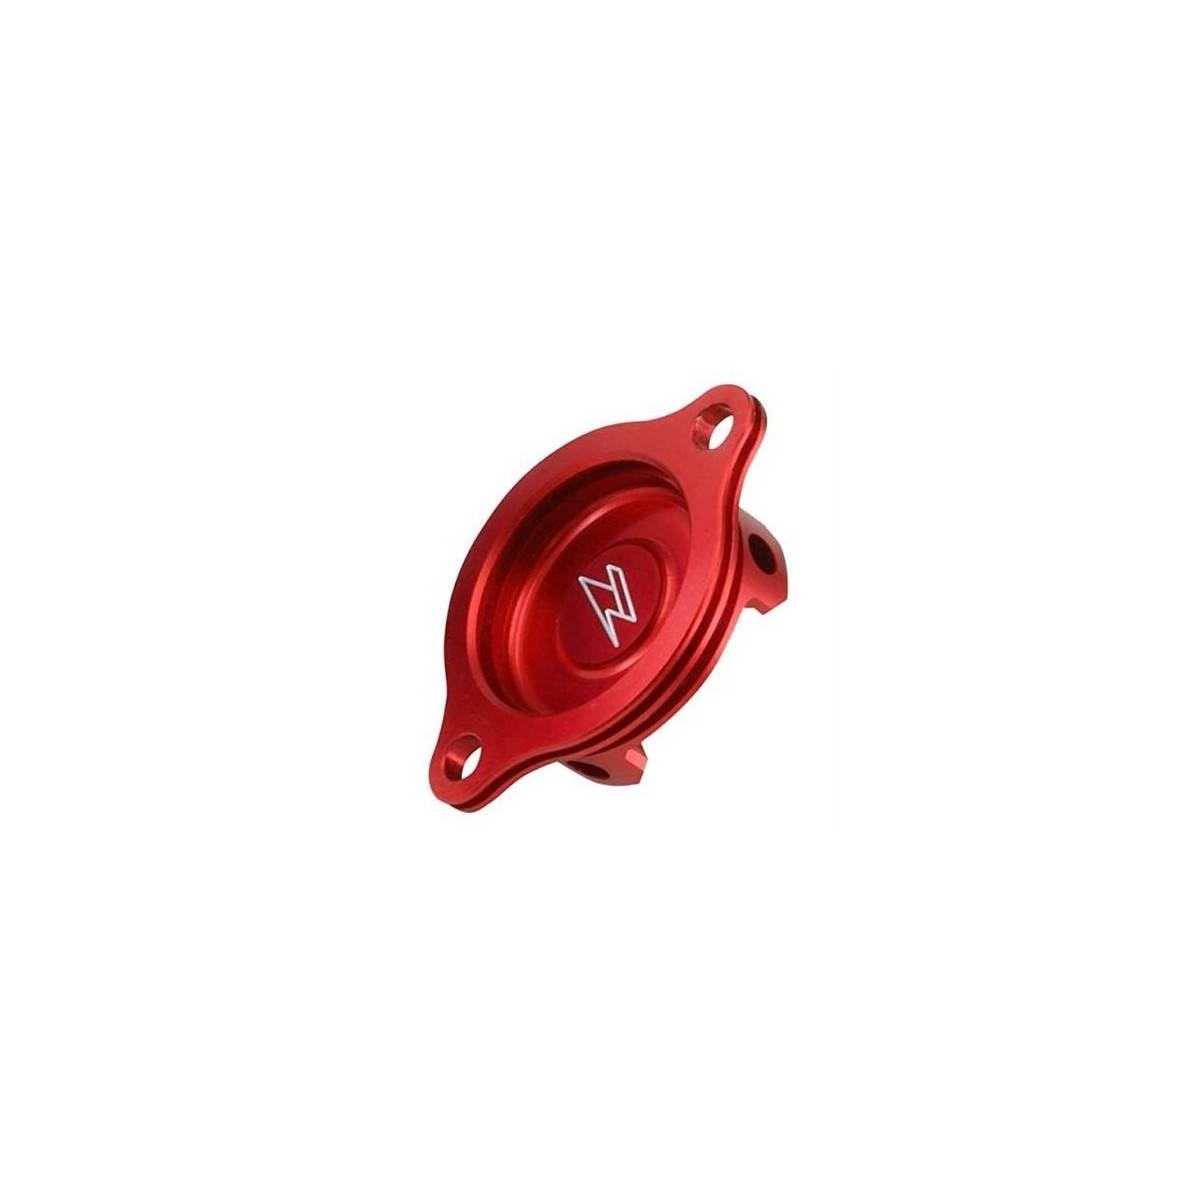 ZE90.1053 - Tapa Filtro Aceite Zeta Crf250R X´04-09 Rojo